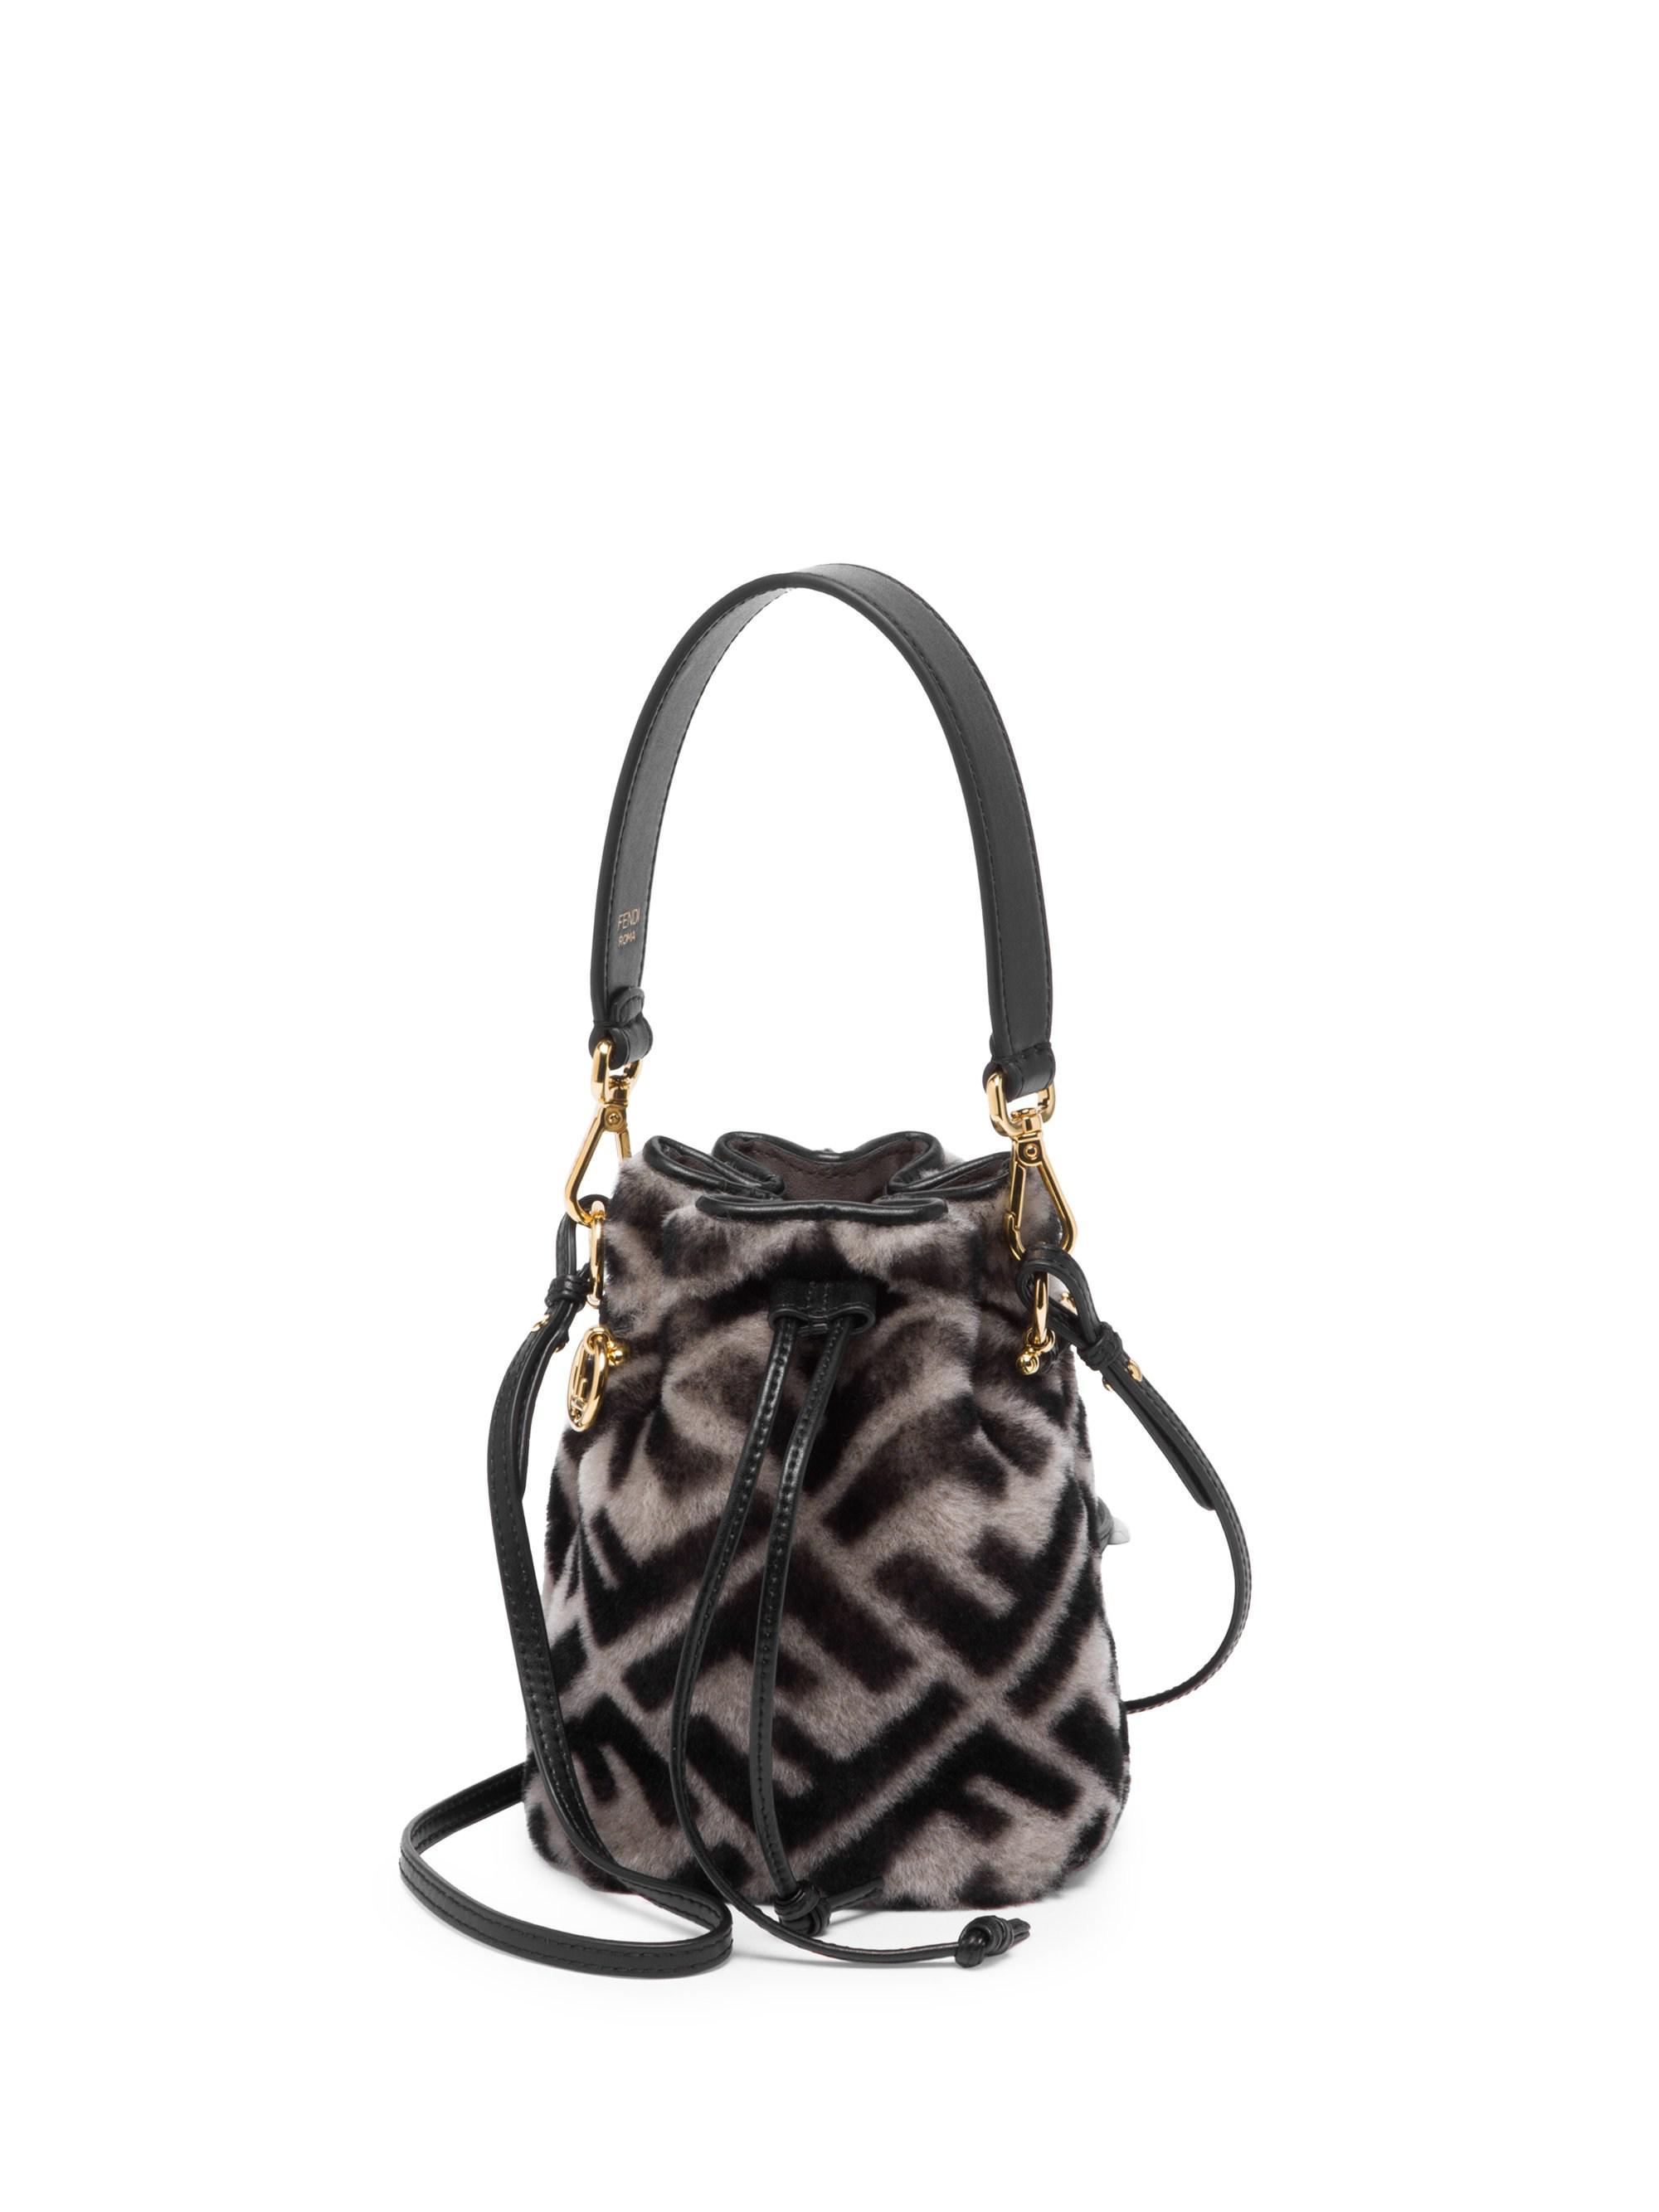 5ef38aec0f95 ... sweden fendi mini mon tresor shearling bucket bag in black lyst e6c71  88e67 ...